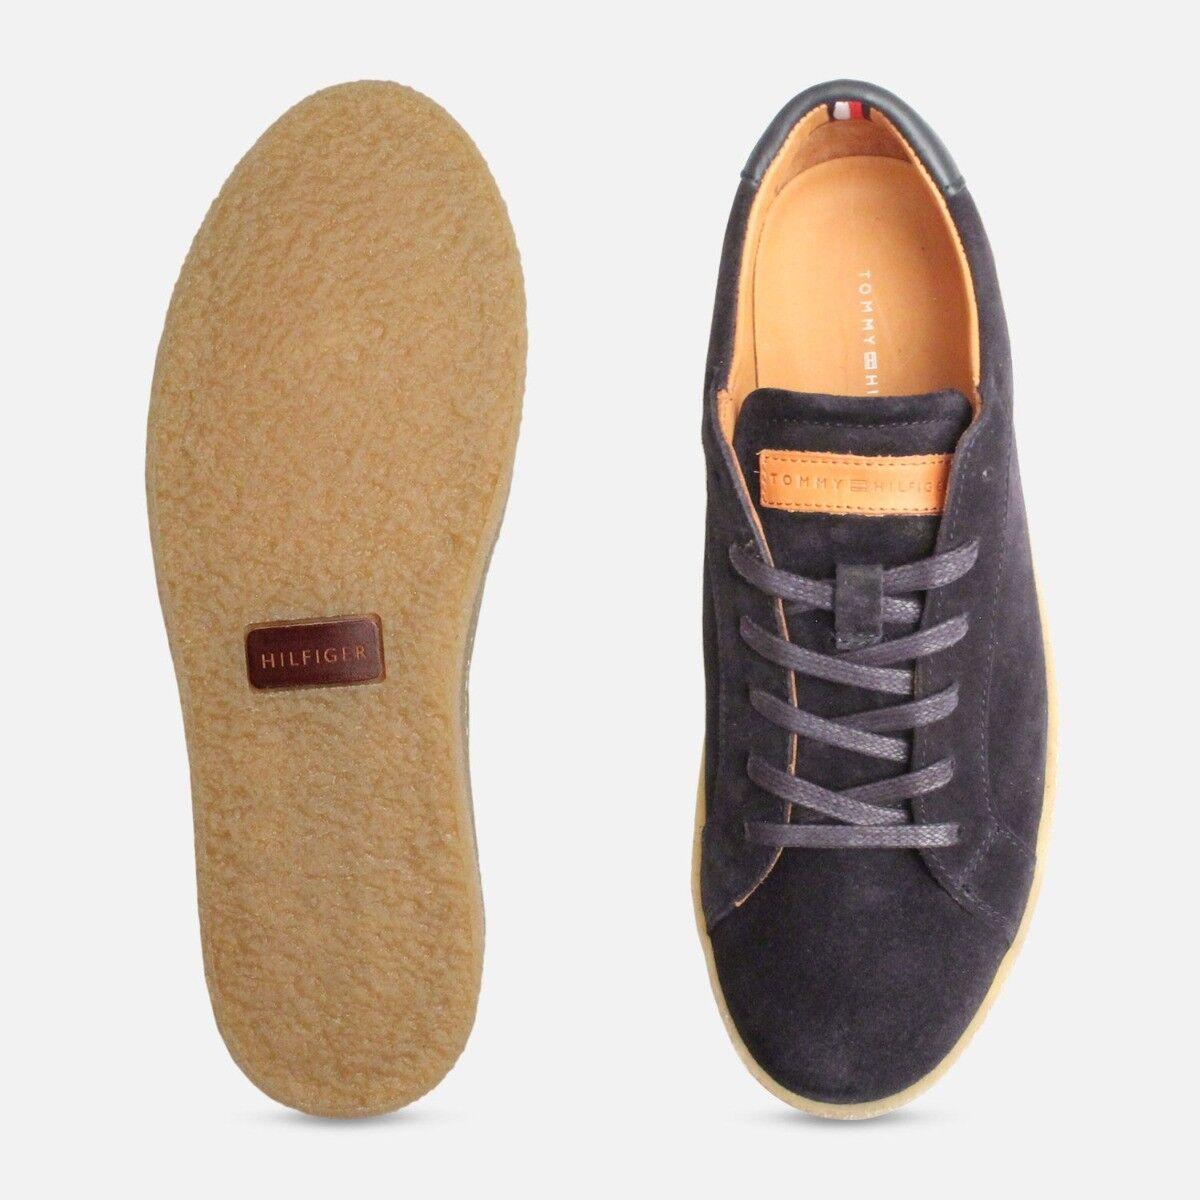 Tommy Hilfiger Luxe bleu marine en daim chaussures de de de loisirs b97744